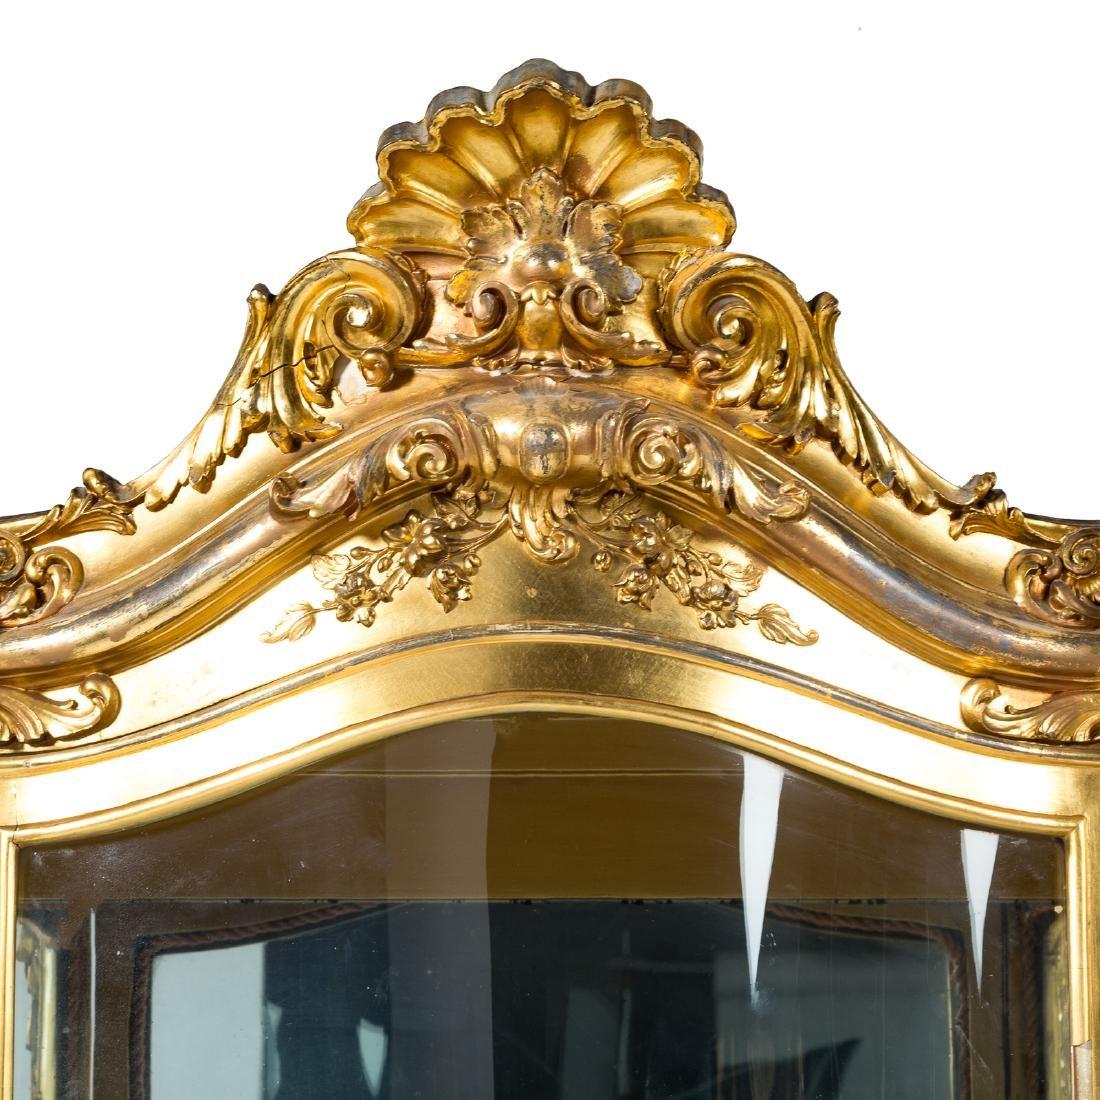 Louis XV style giltwood bombe vitrine - 3